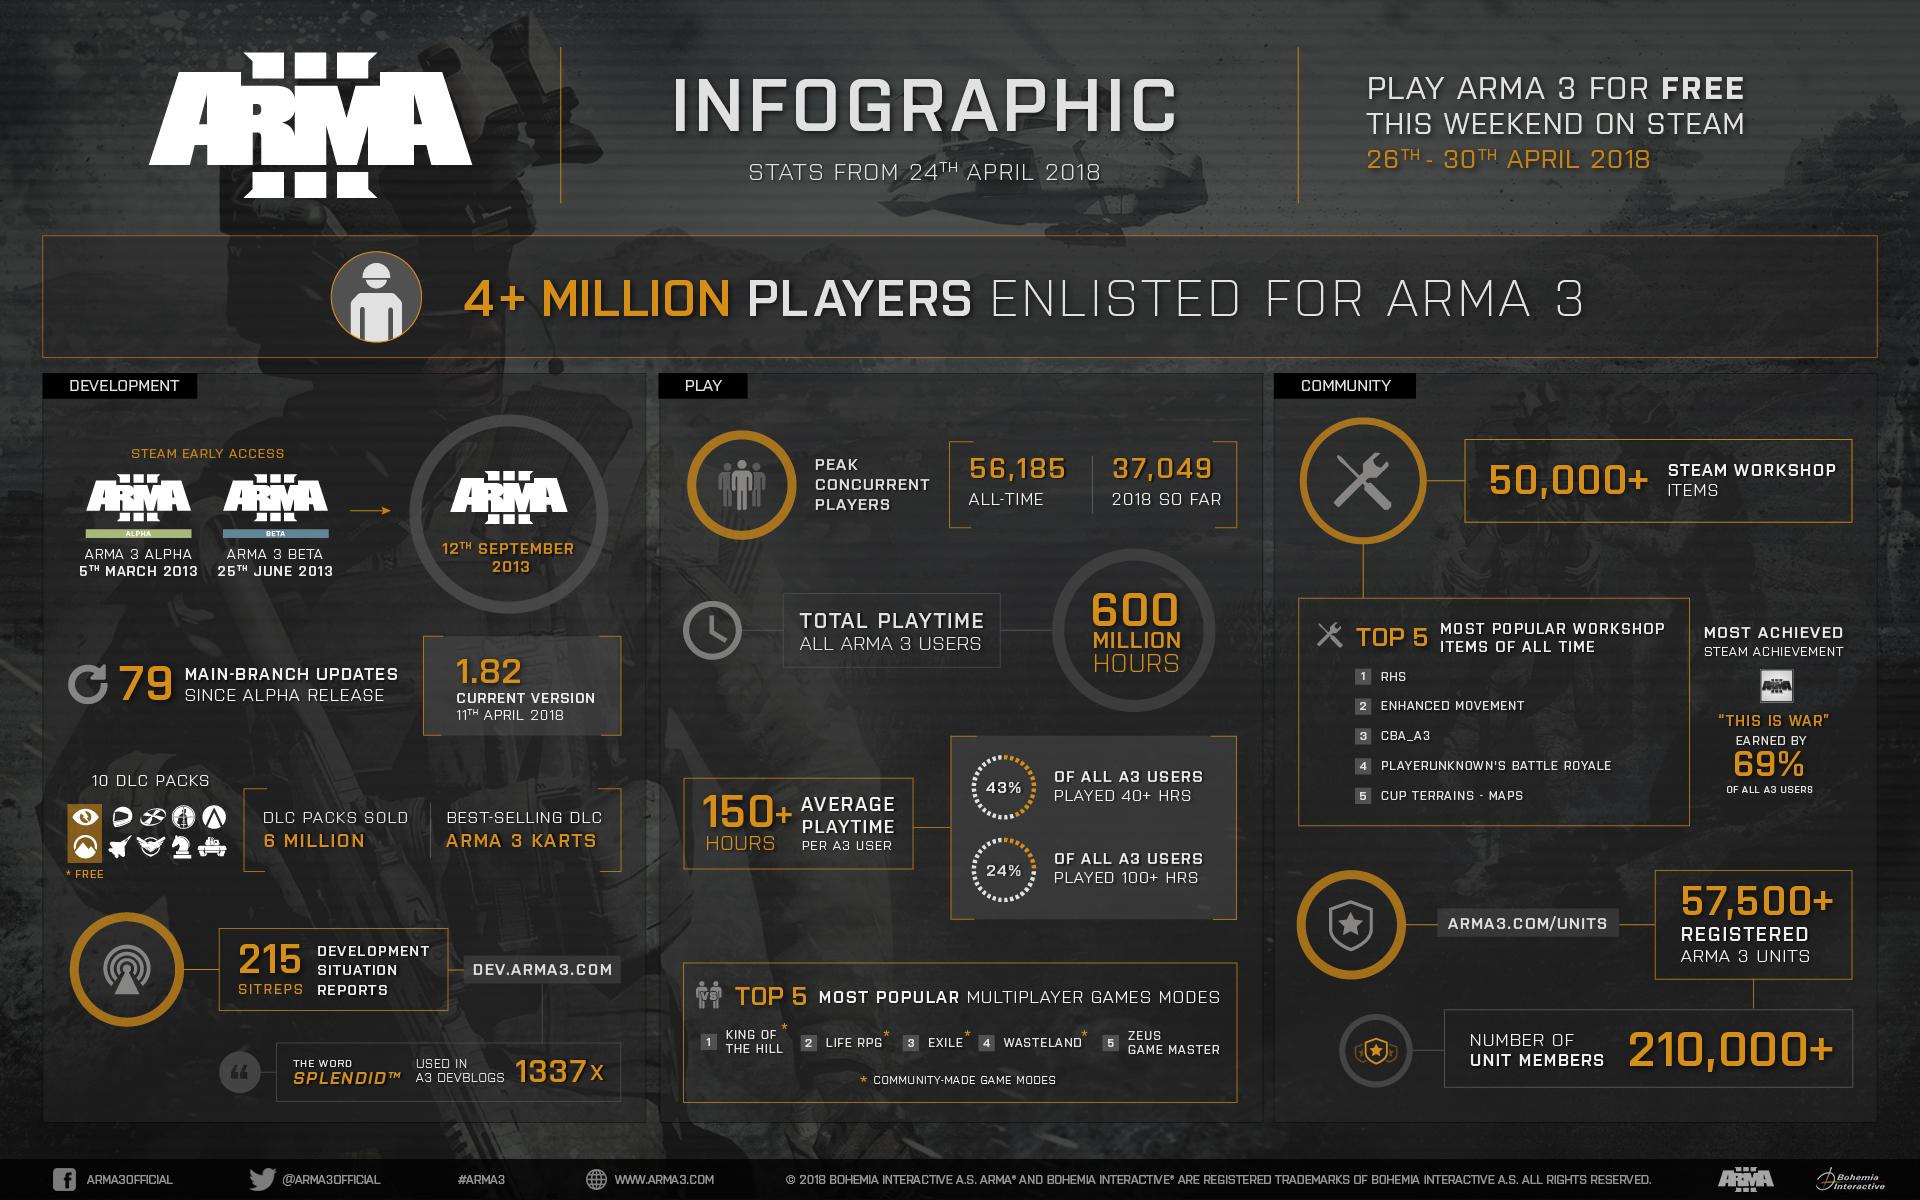 ARMA 3 ROADMAP 2018 | News | Arma 3 Development Roadmap on